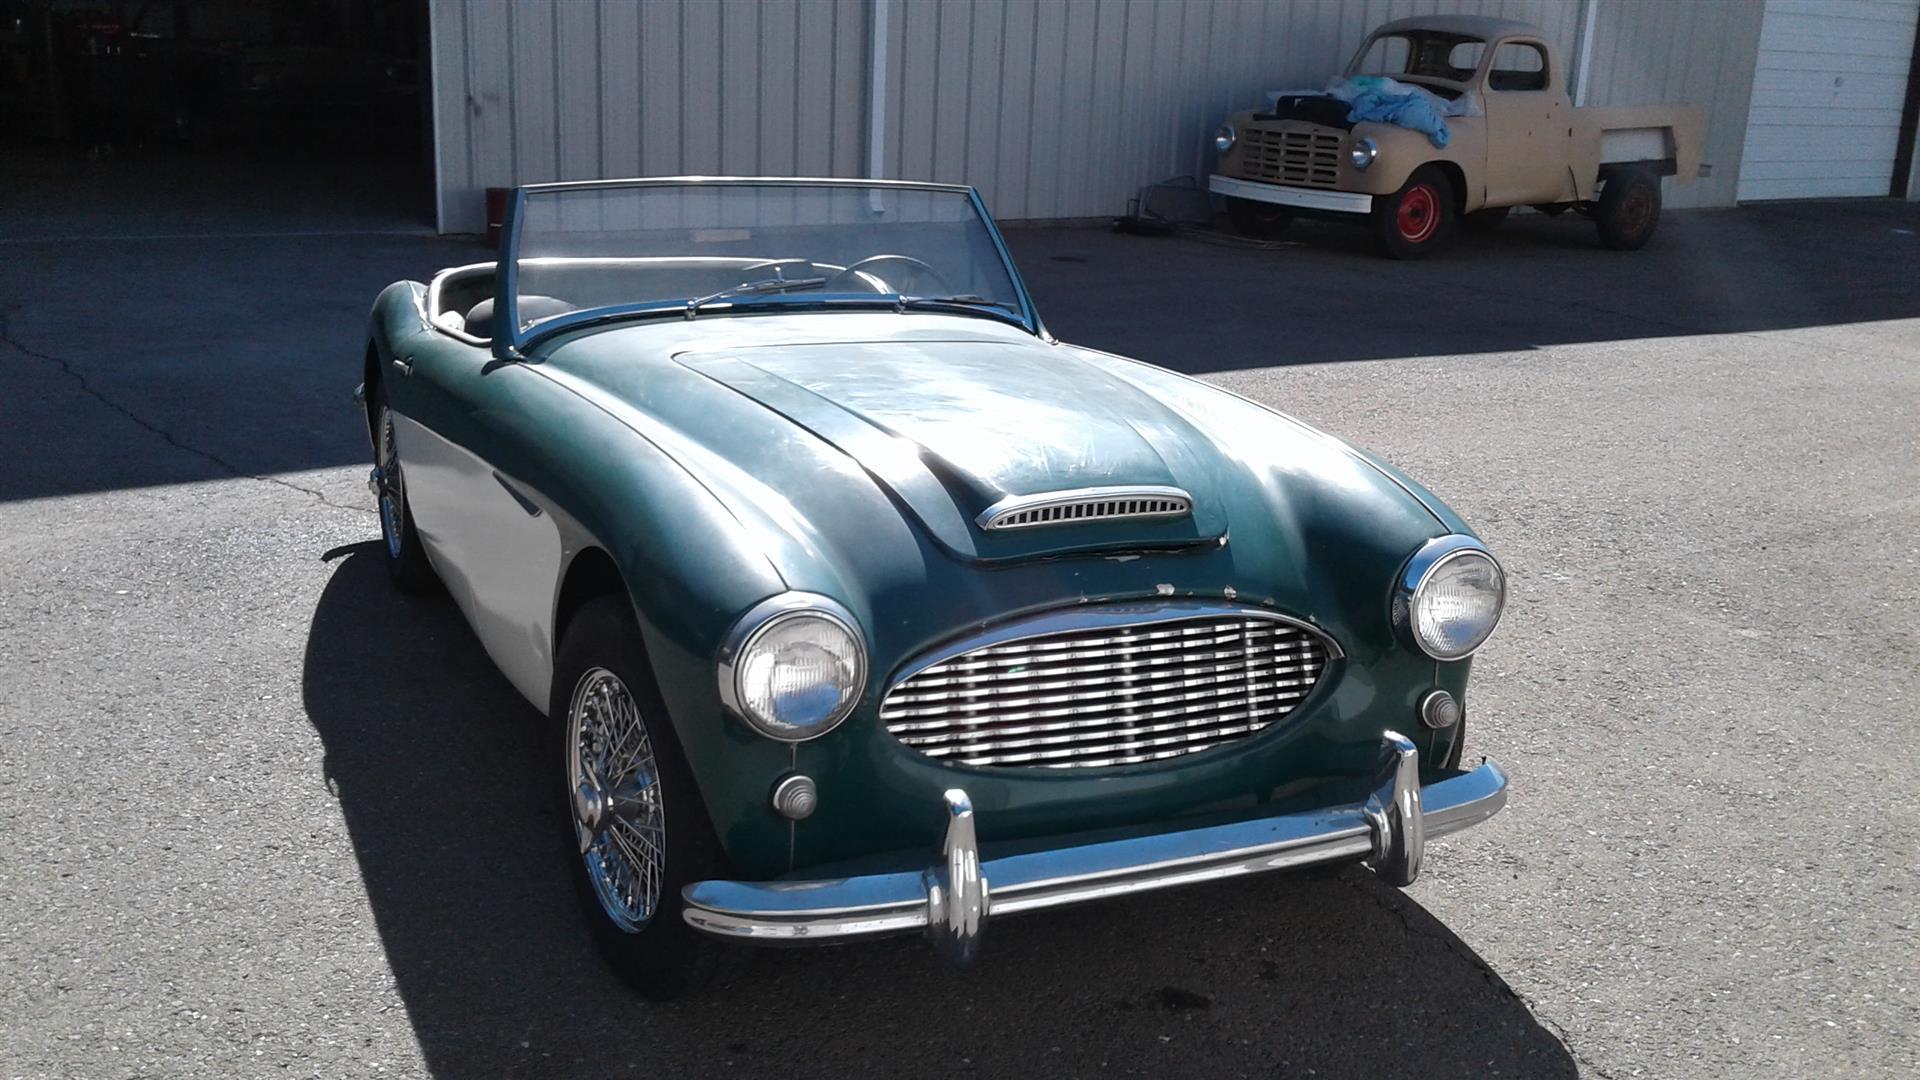 austin healey 100 6 2 2 seater joop stolze classic cars. Black Bedroom Furniture Sets. Home Design Ideas